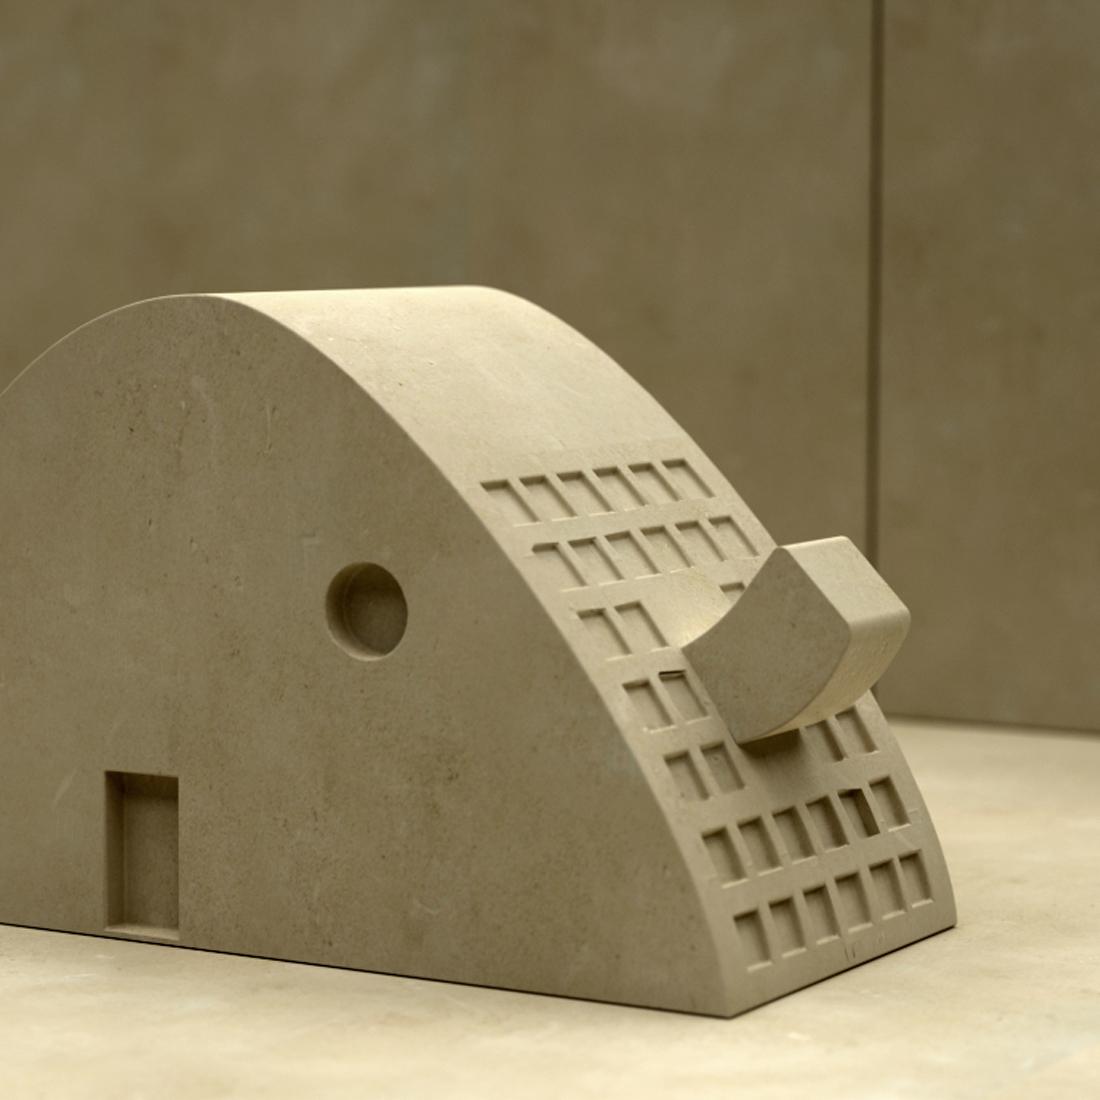 Casa_Elefante_modellino_1100